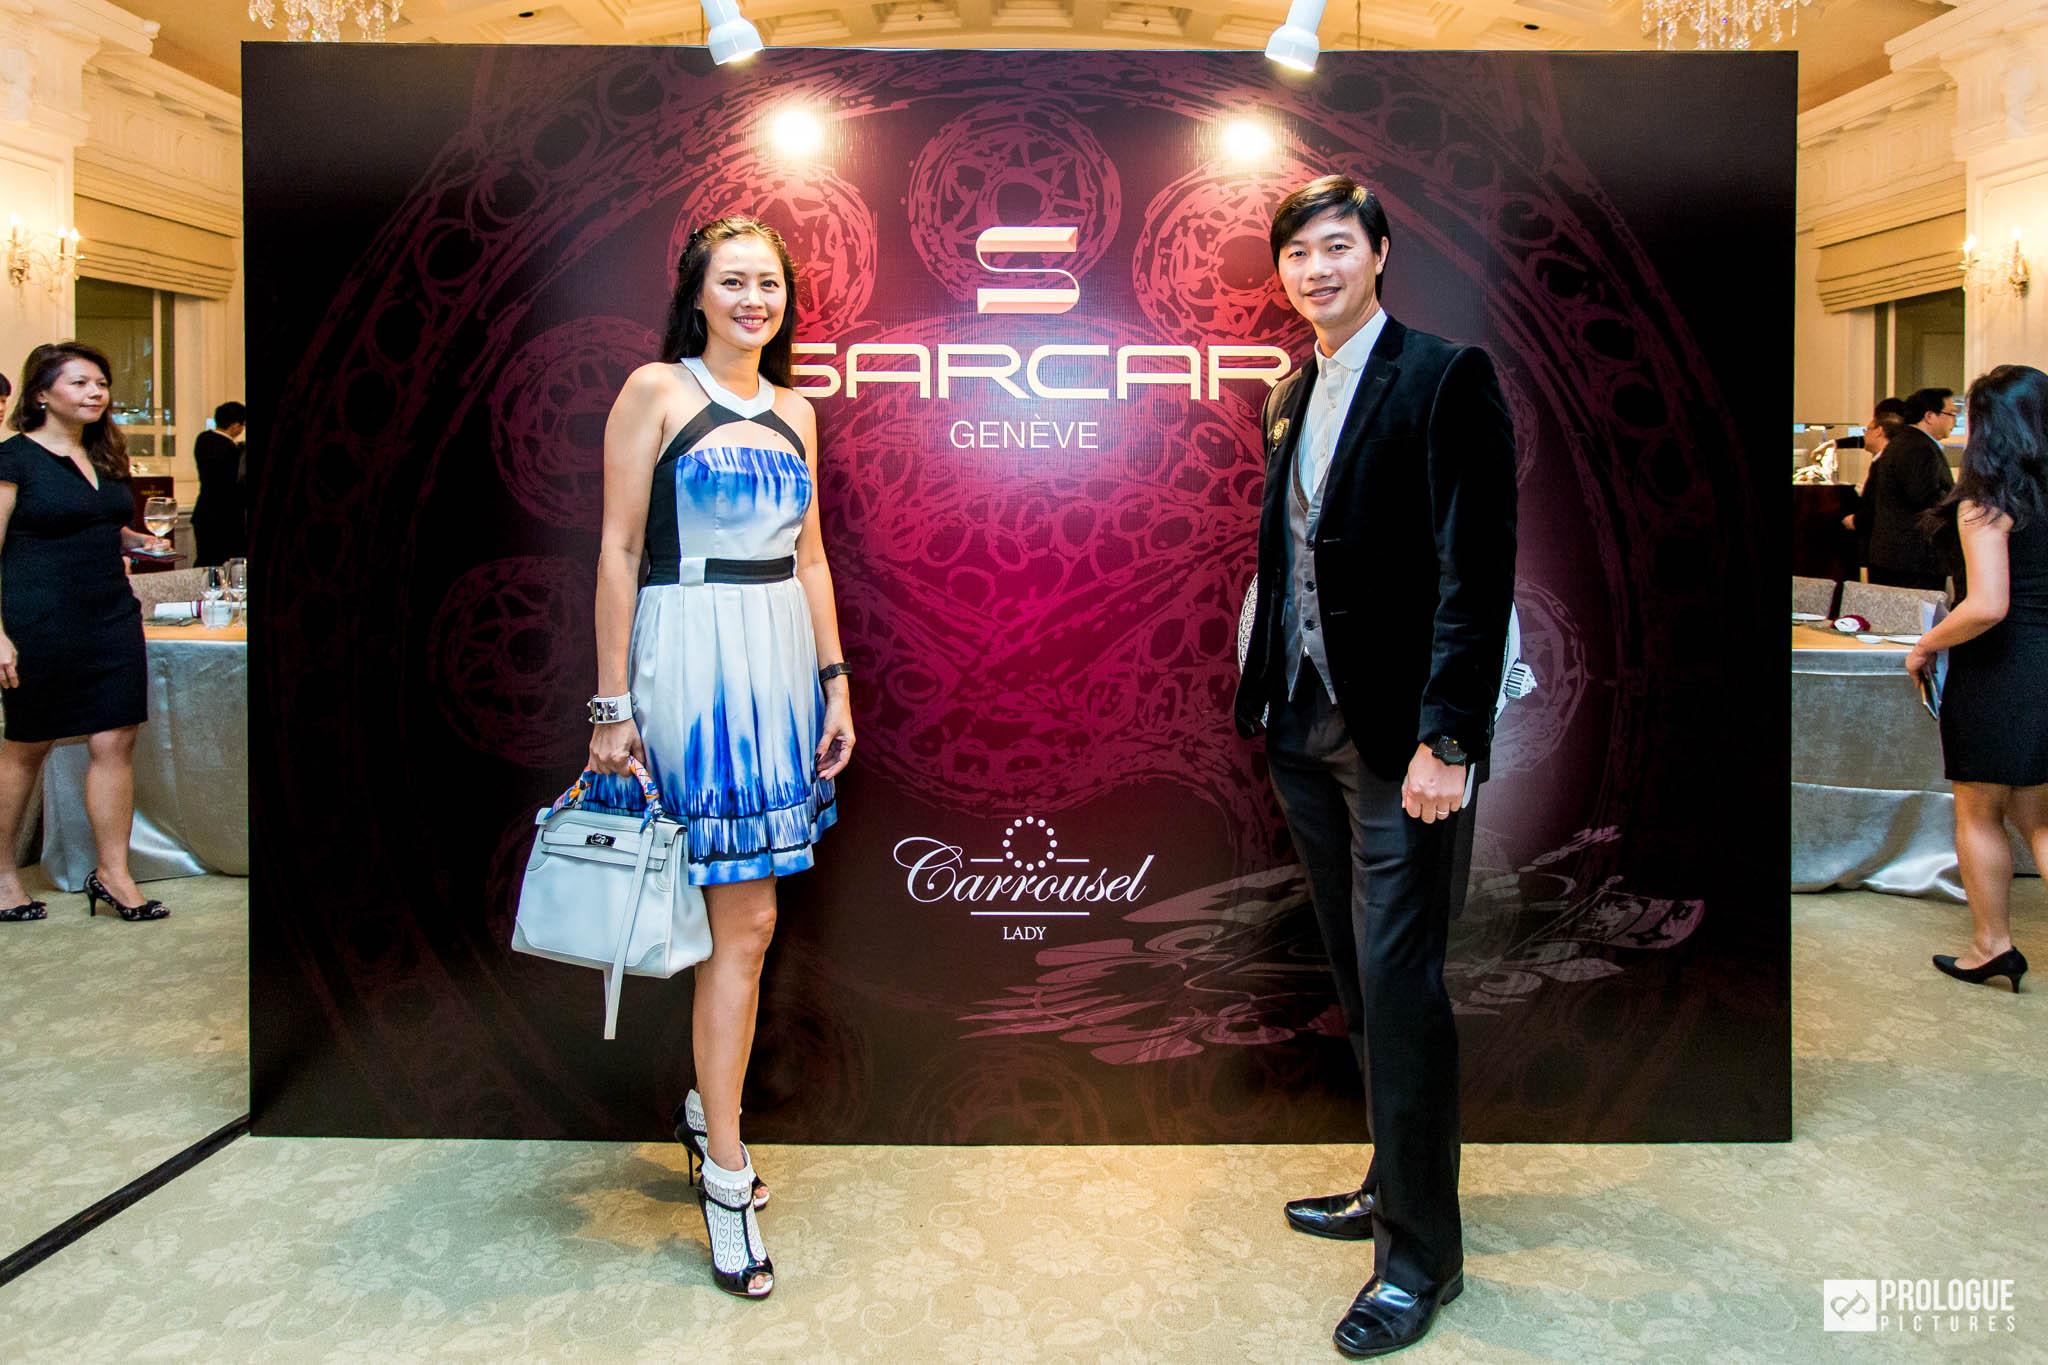 sarcar-le-carrousel-collection-event-photography-singapore-prologue-pictures-04